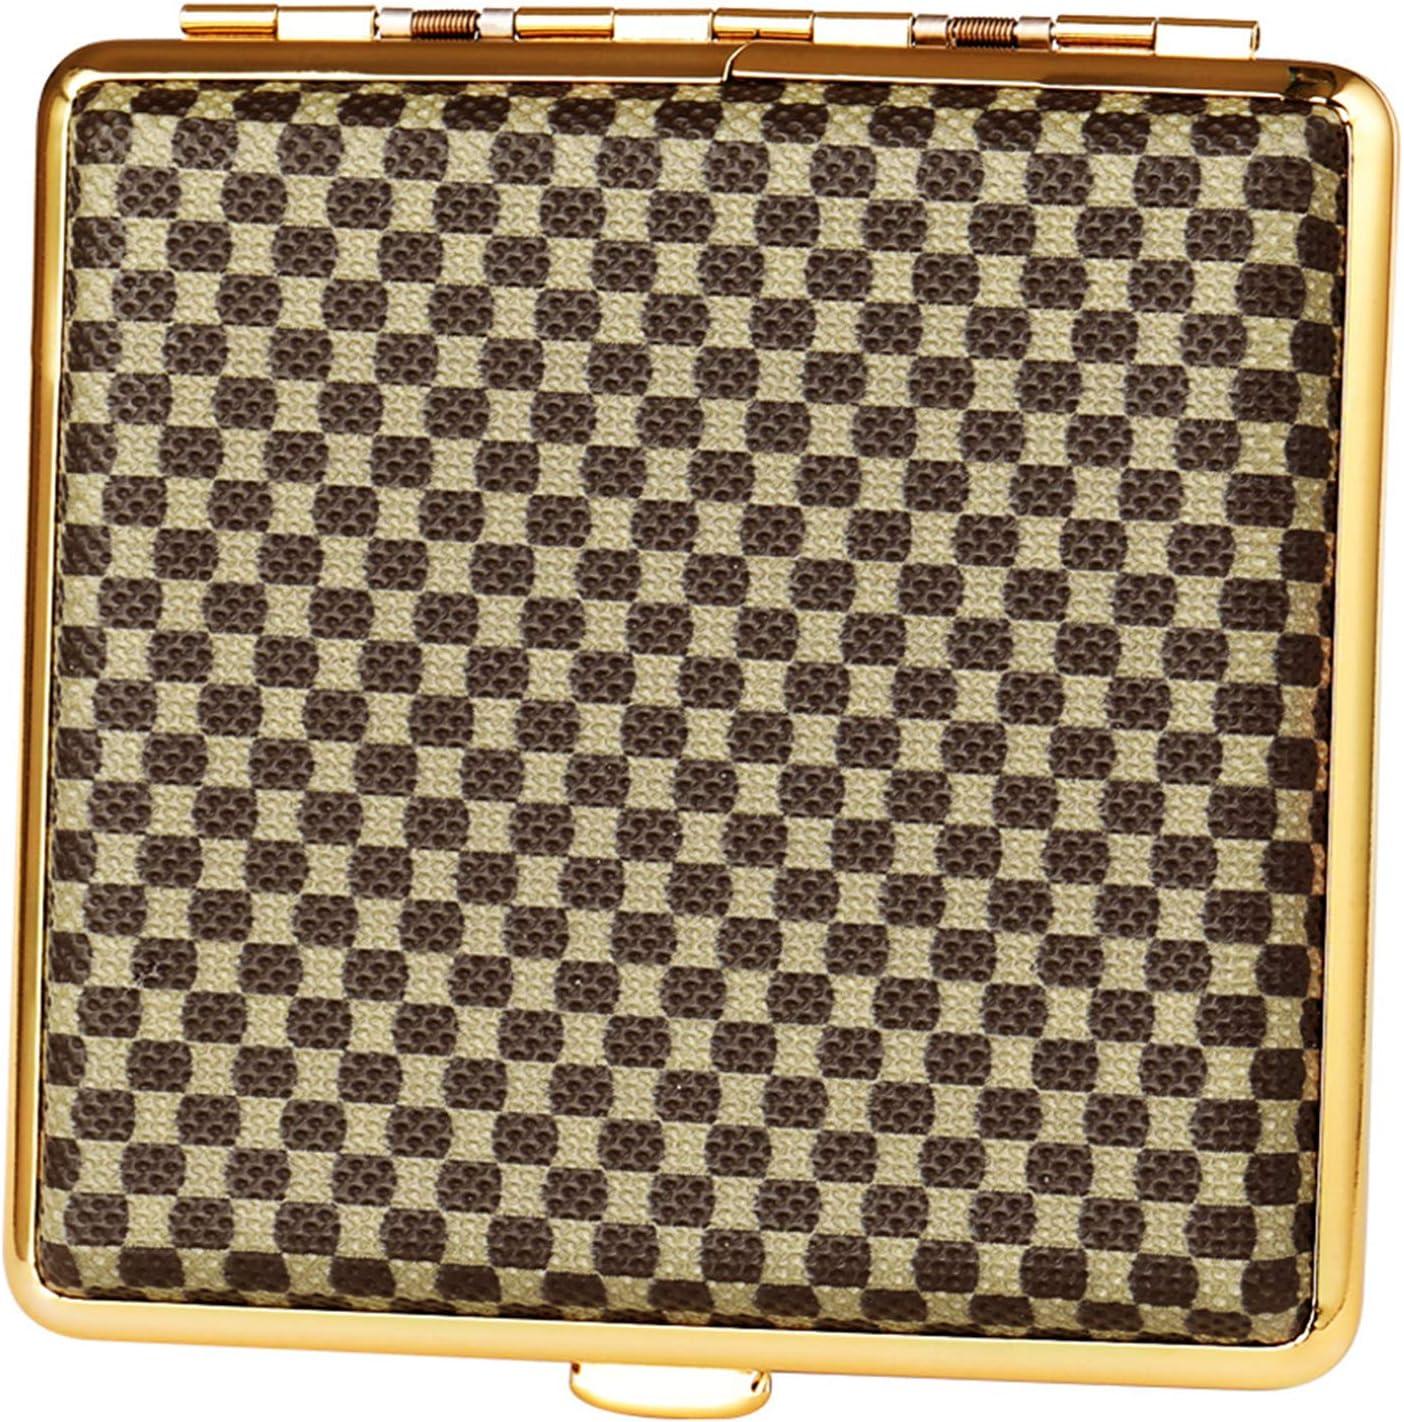 BNMY Superlatite Cigarette Case Super sale period limited Leather C Frame Holder Metal